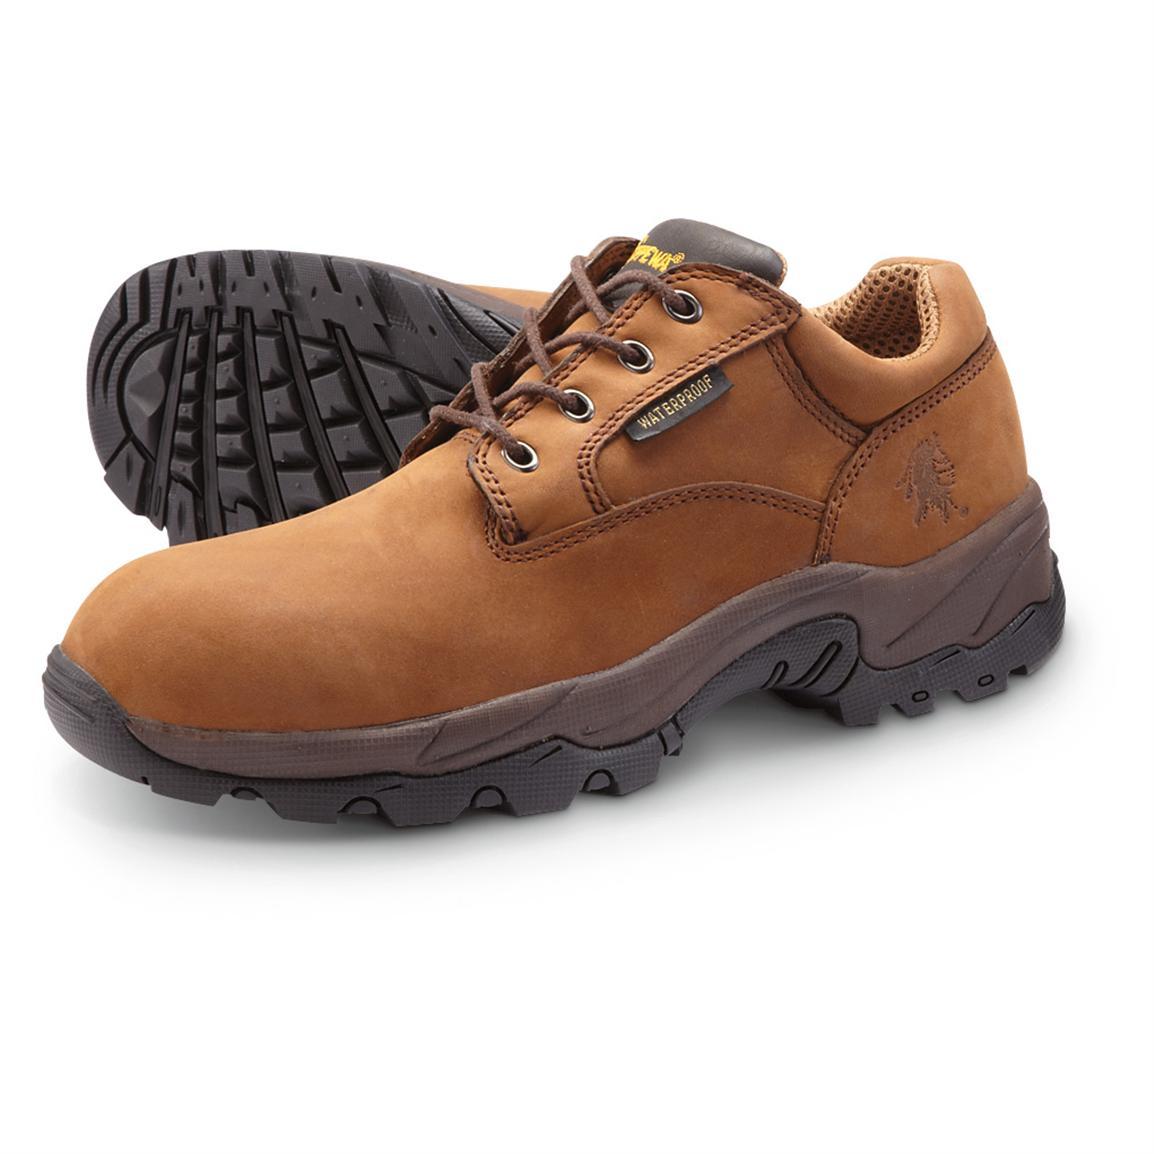 menu0027s chippewa boots waterproof oxford work shoes, brown gtdckuh